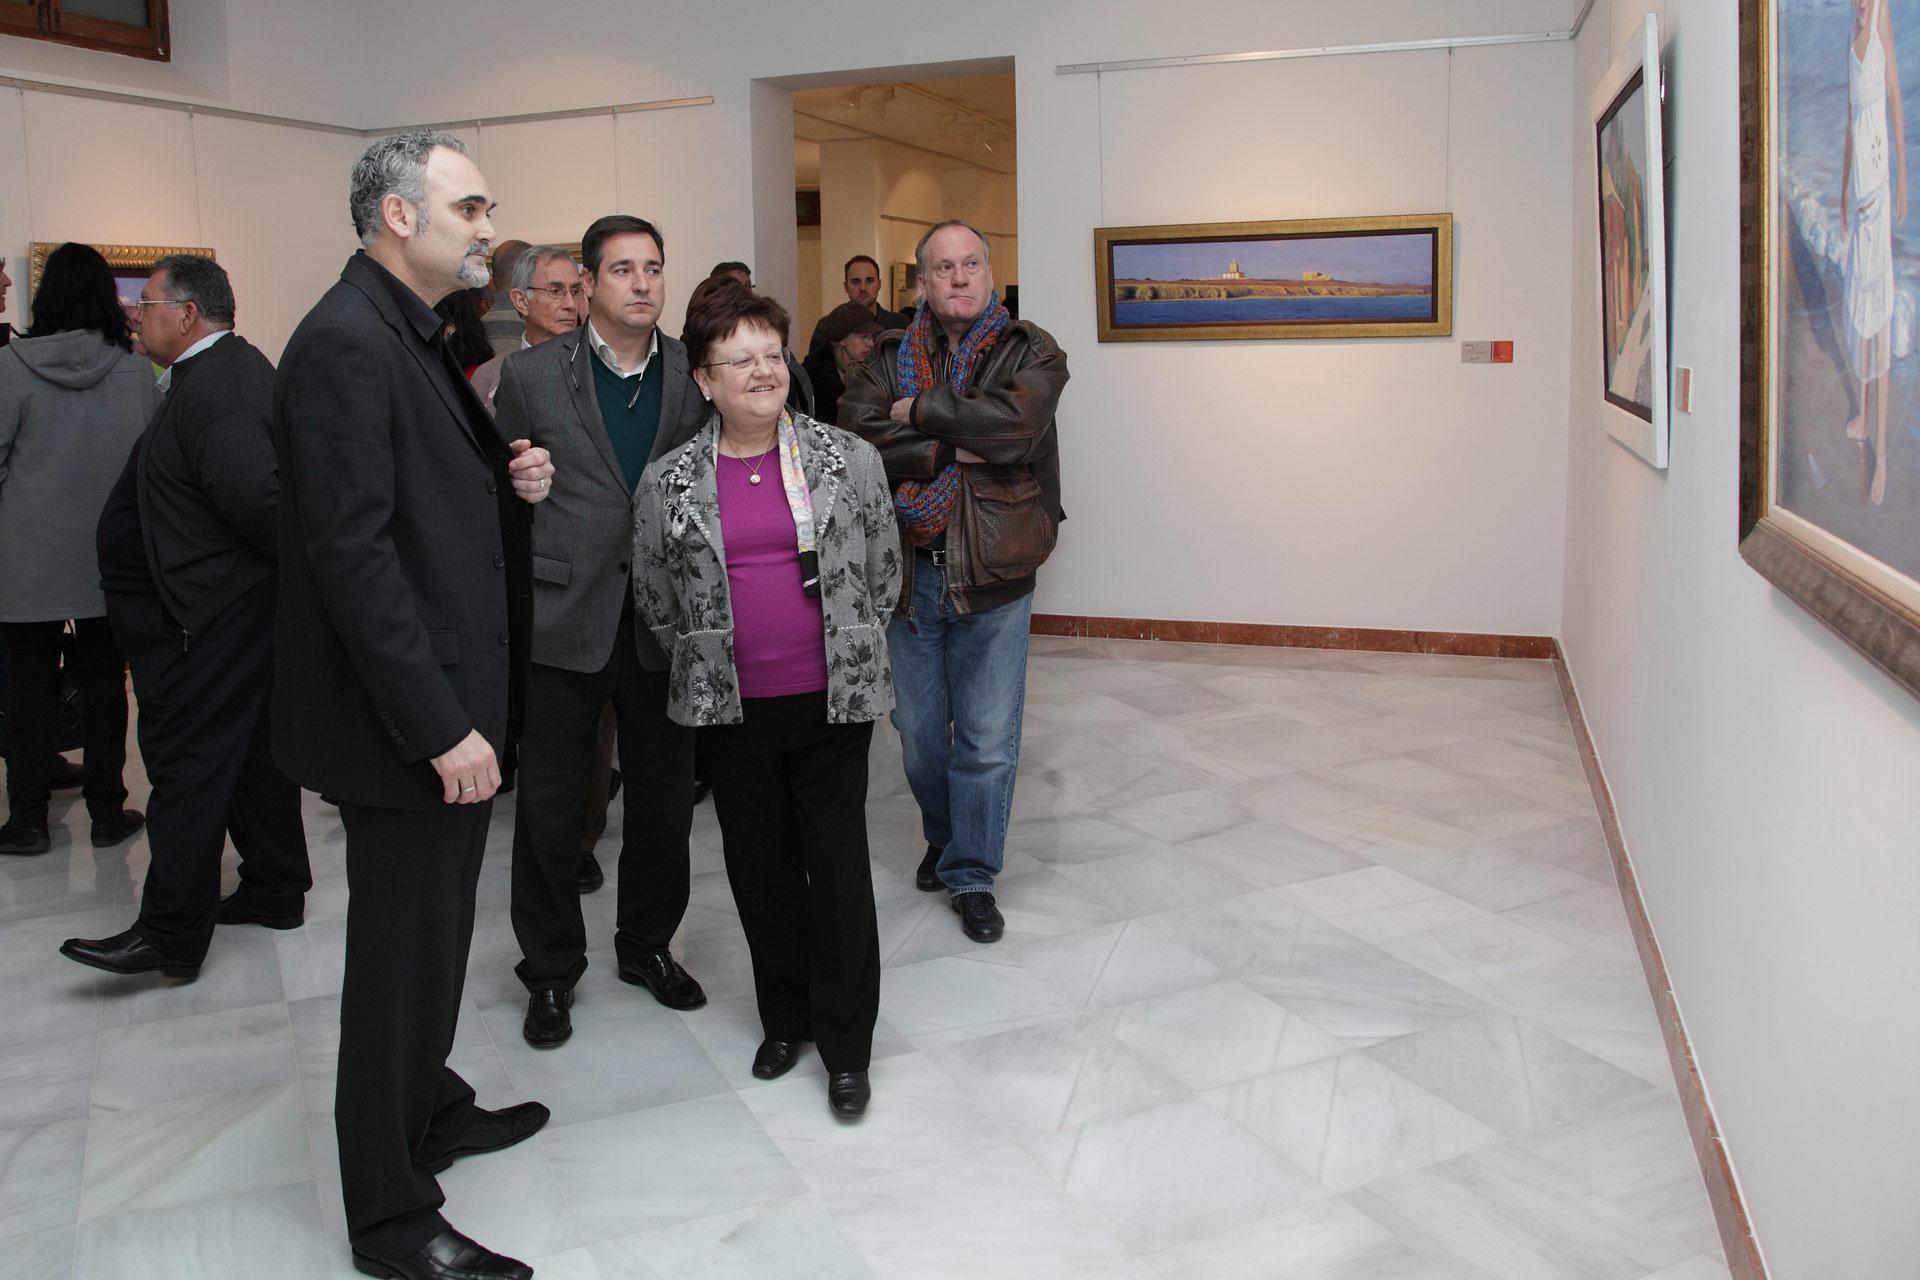 Exposicion-Diputación-de-Alicante,-Esbozos-del-Alma,-José-Cerezo,alcaldesa-de-san-vicente